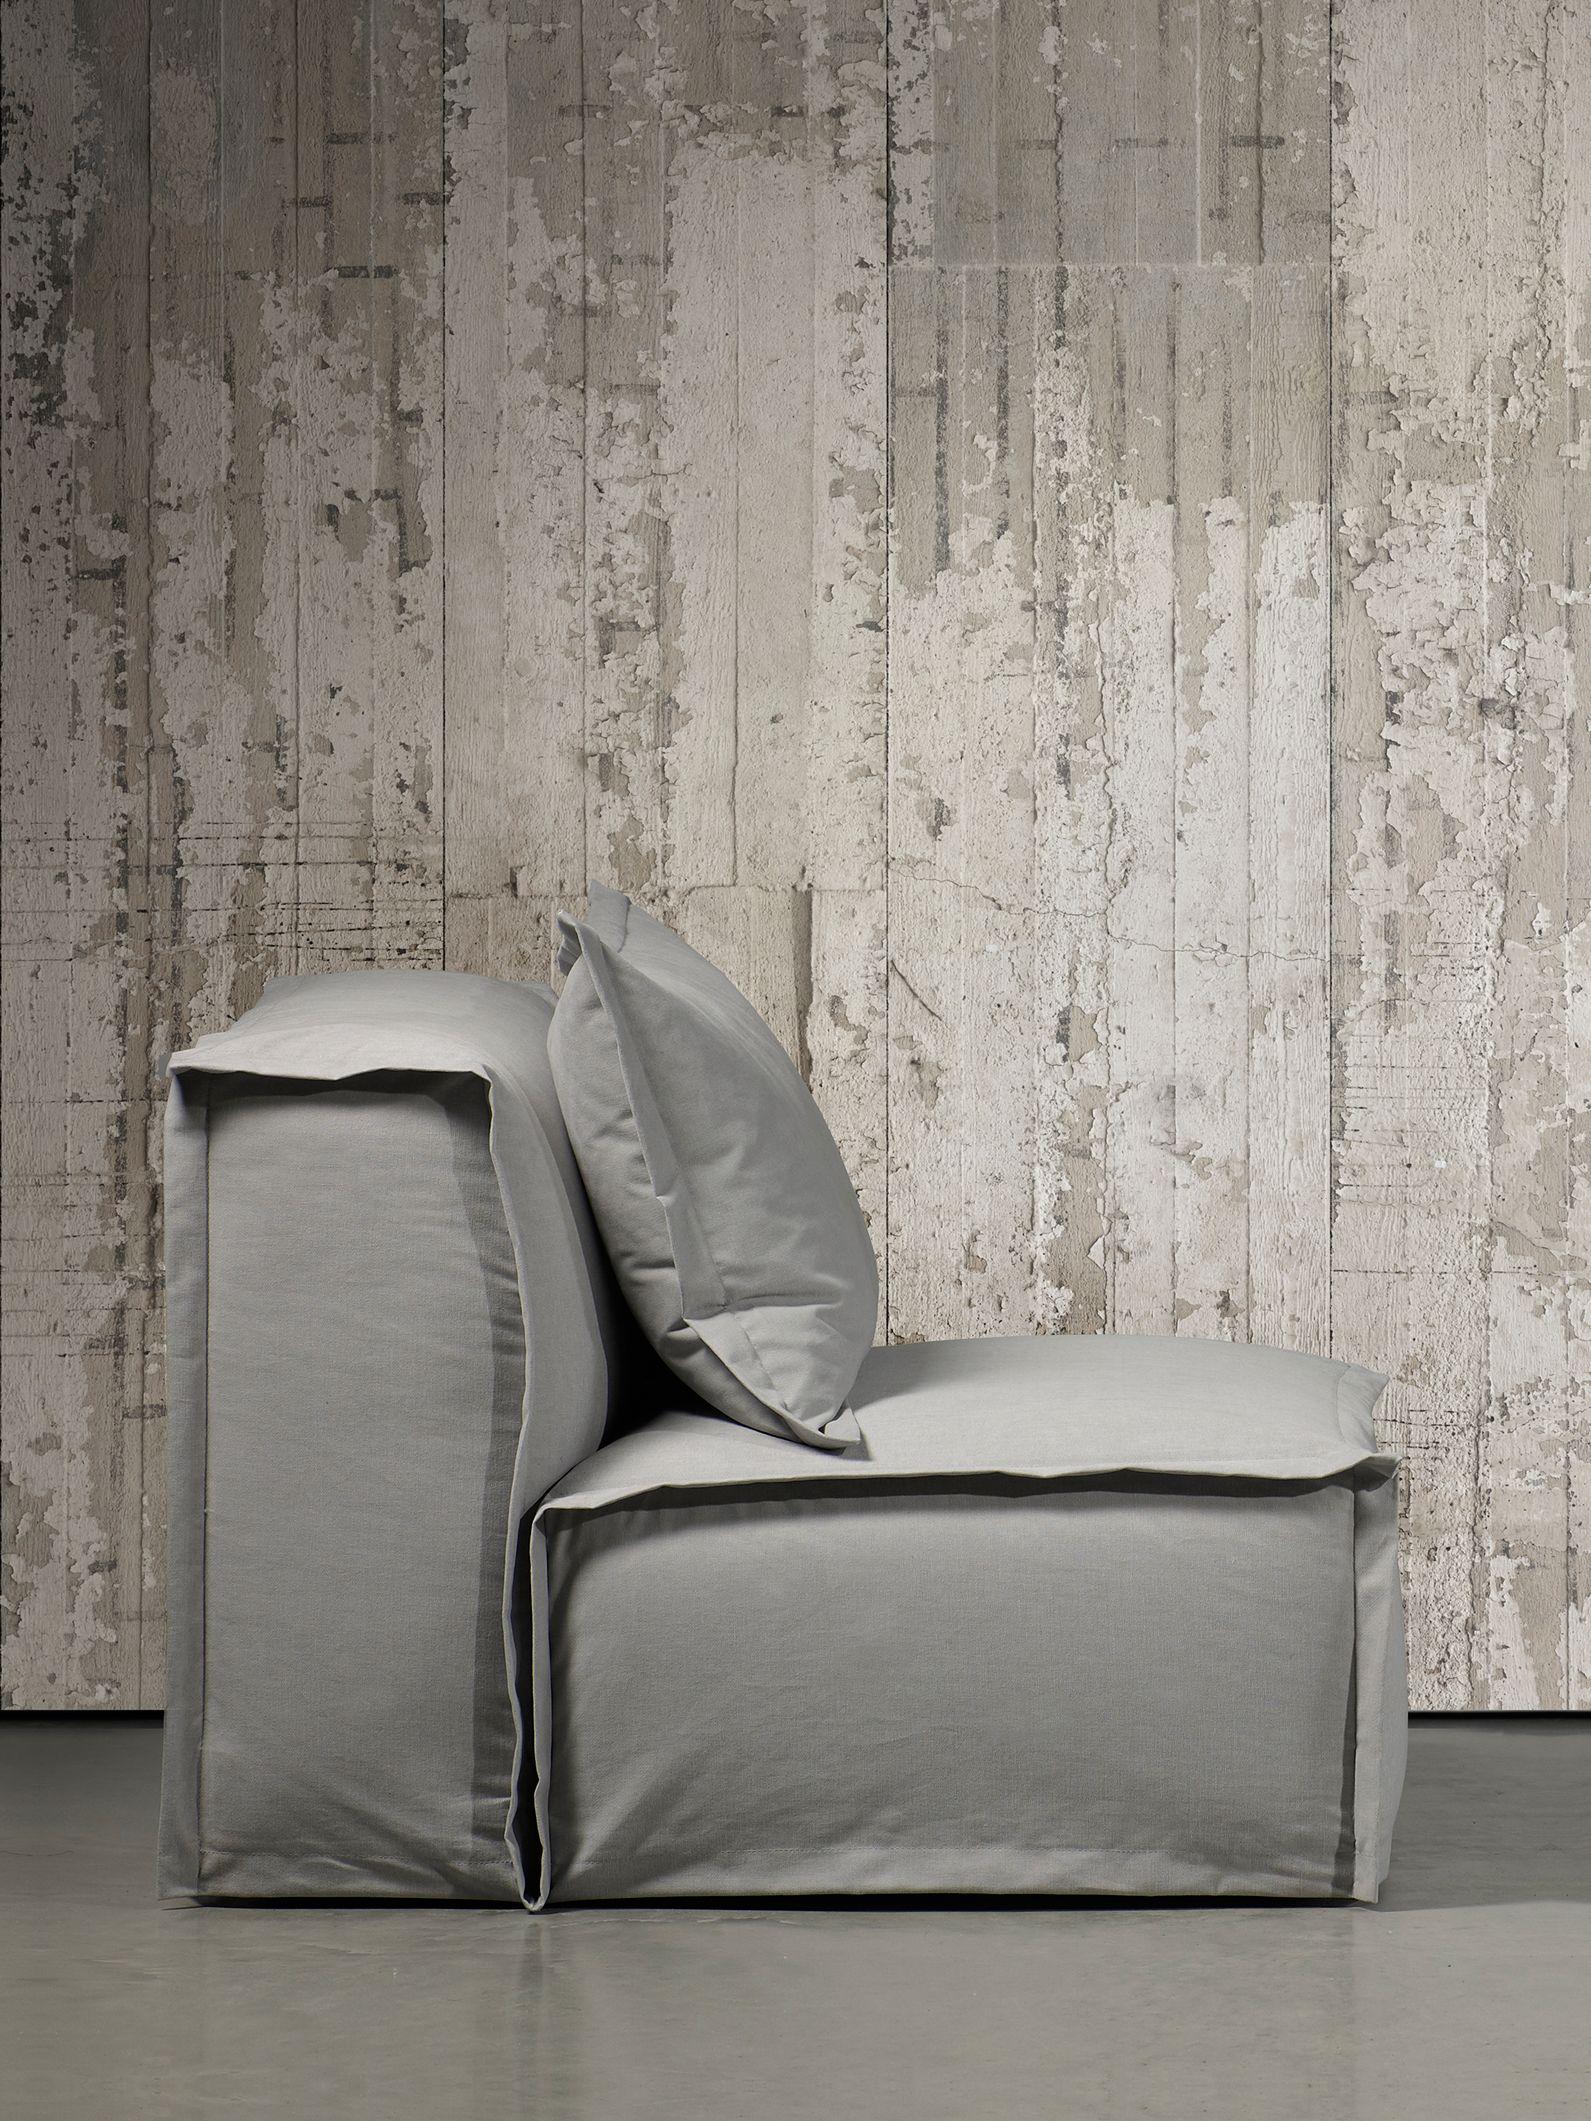 NLXL NLXL Concrete Paste the Wall Wallpaper